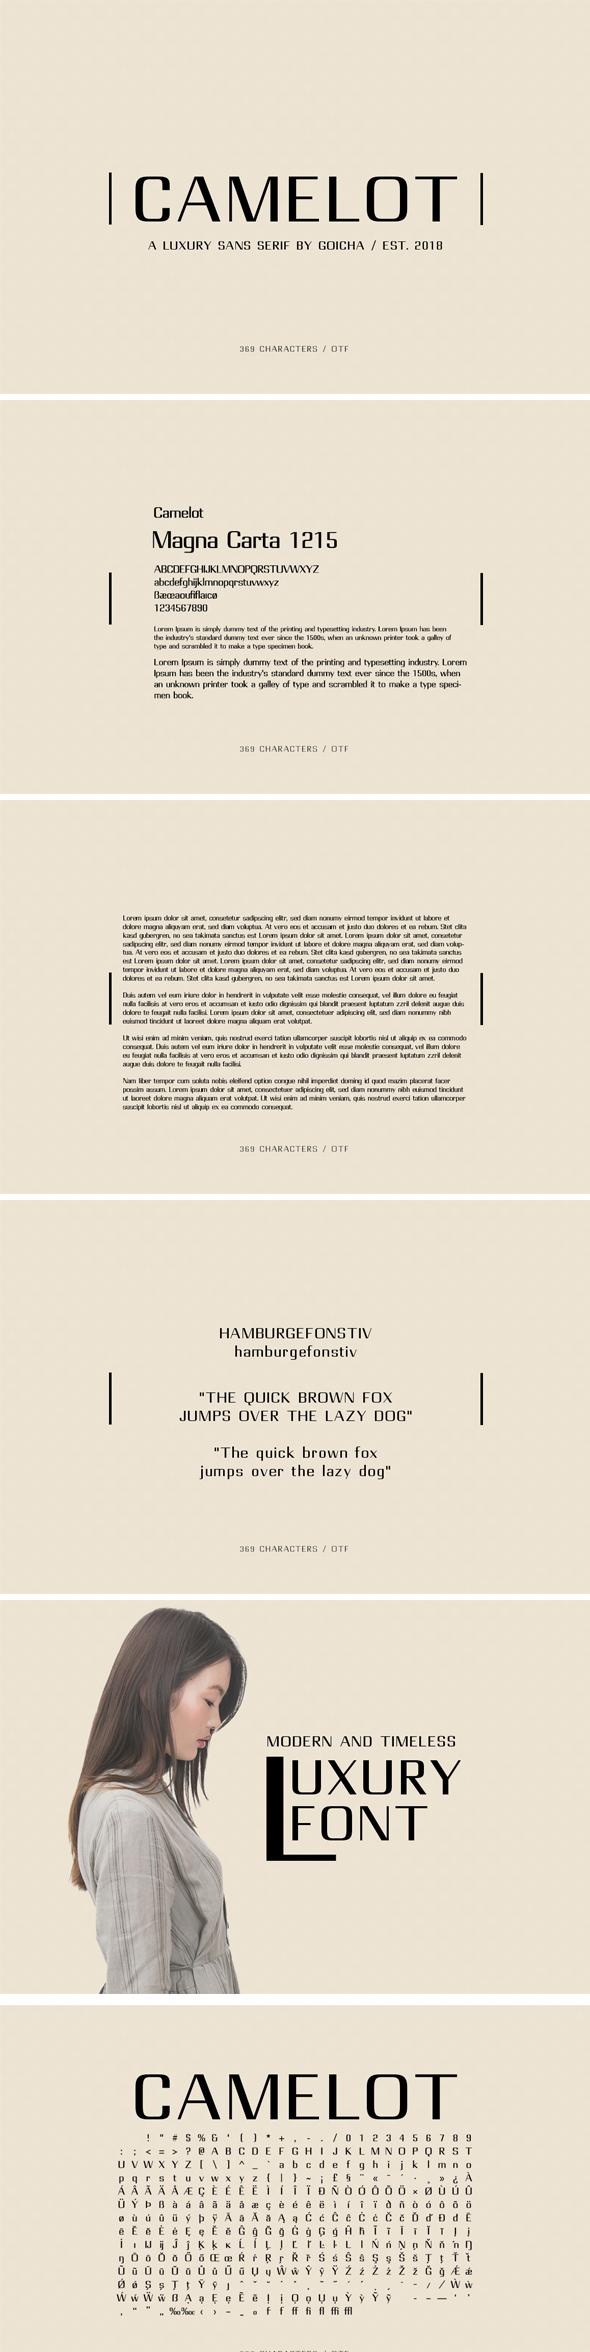 Camelot - Luxury Sans Serif - Sans-Serif Fonts